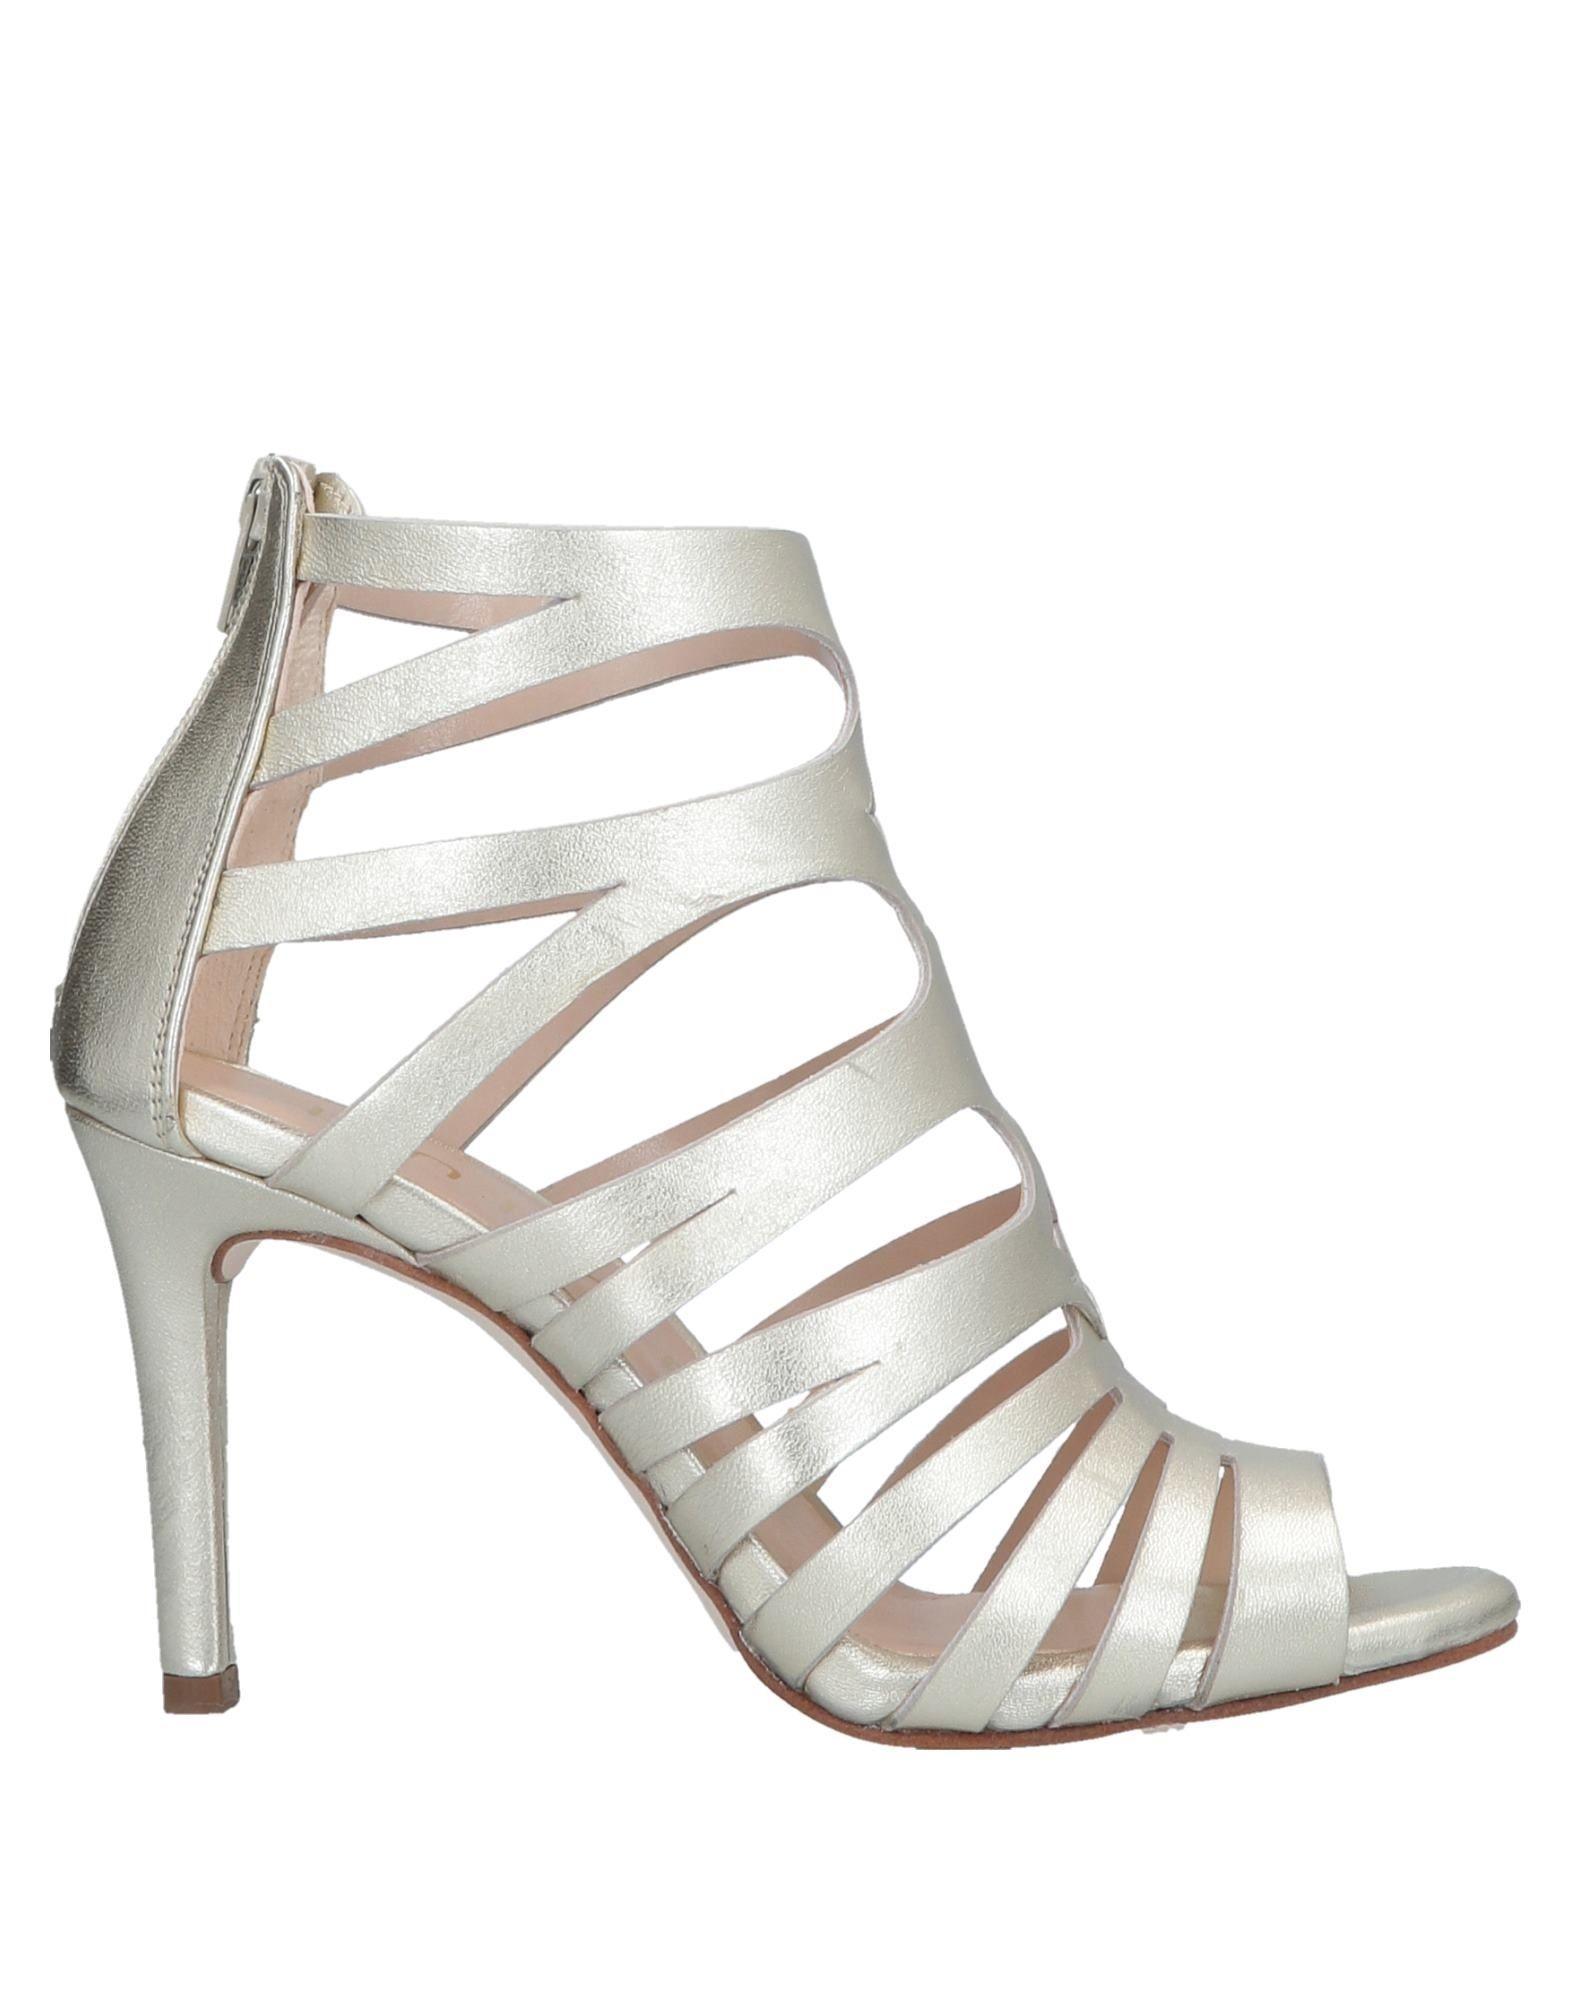 f6d5f1a383a7 Lyst - Unisa Sandals in Metallic